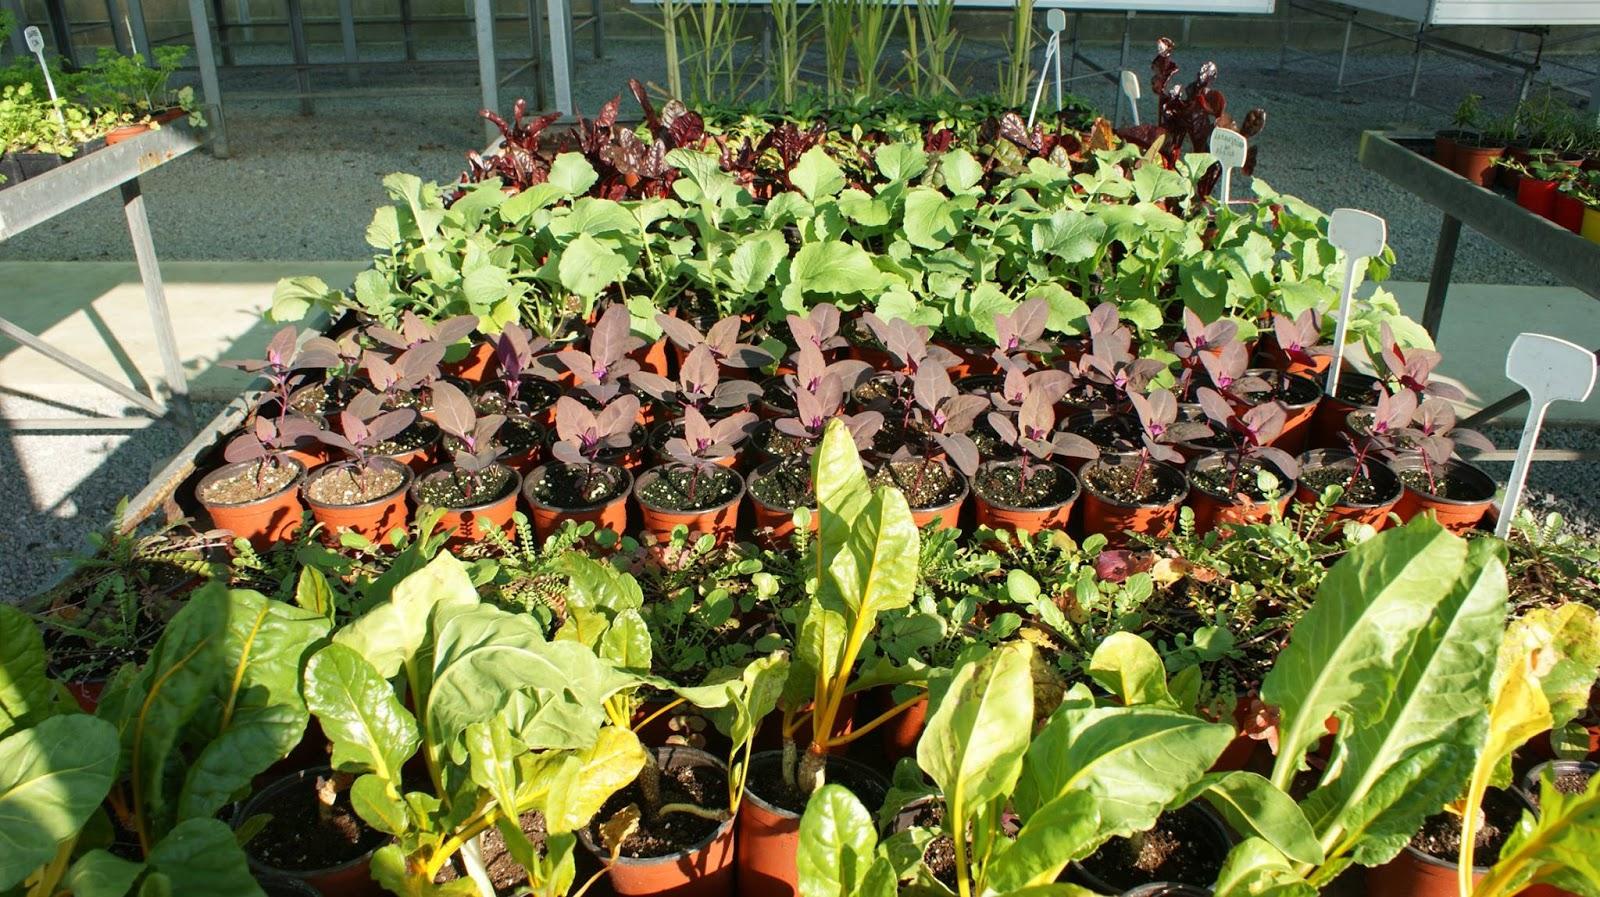 http://www.cantinhodasaromaticas.pt/loja/plantas-em-vaso-bio/